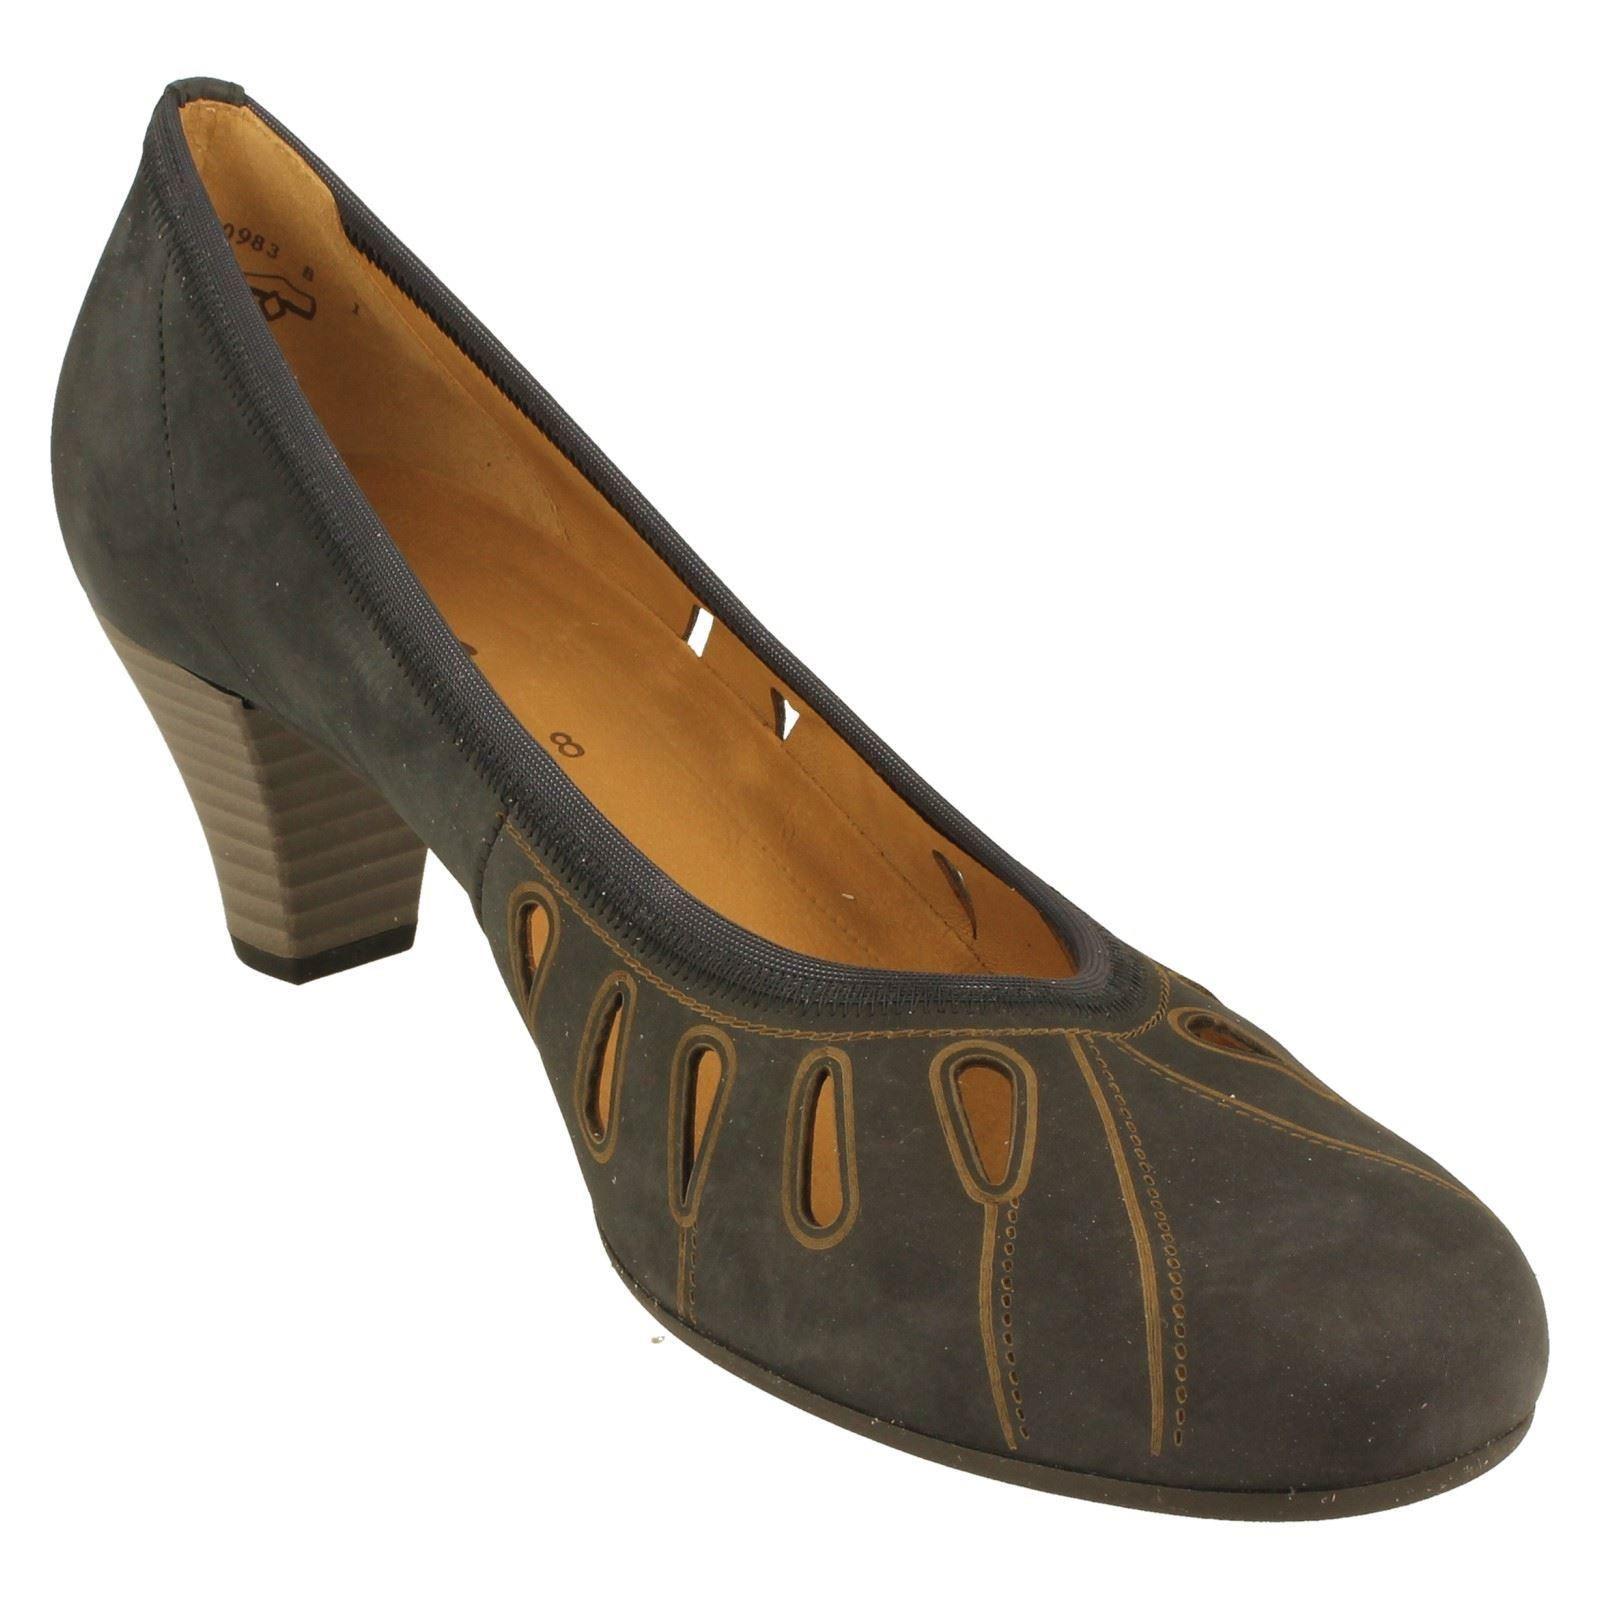 Scarpe eleganti donna Gabor stile 25.487 25.487 25.487 - W d08285